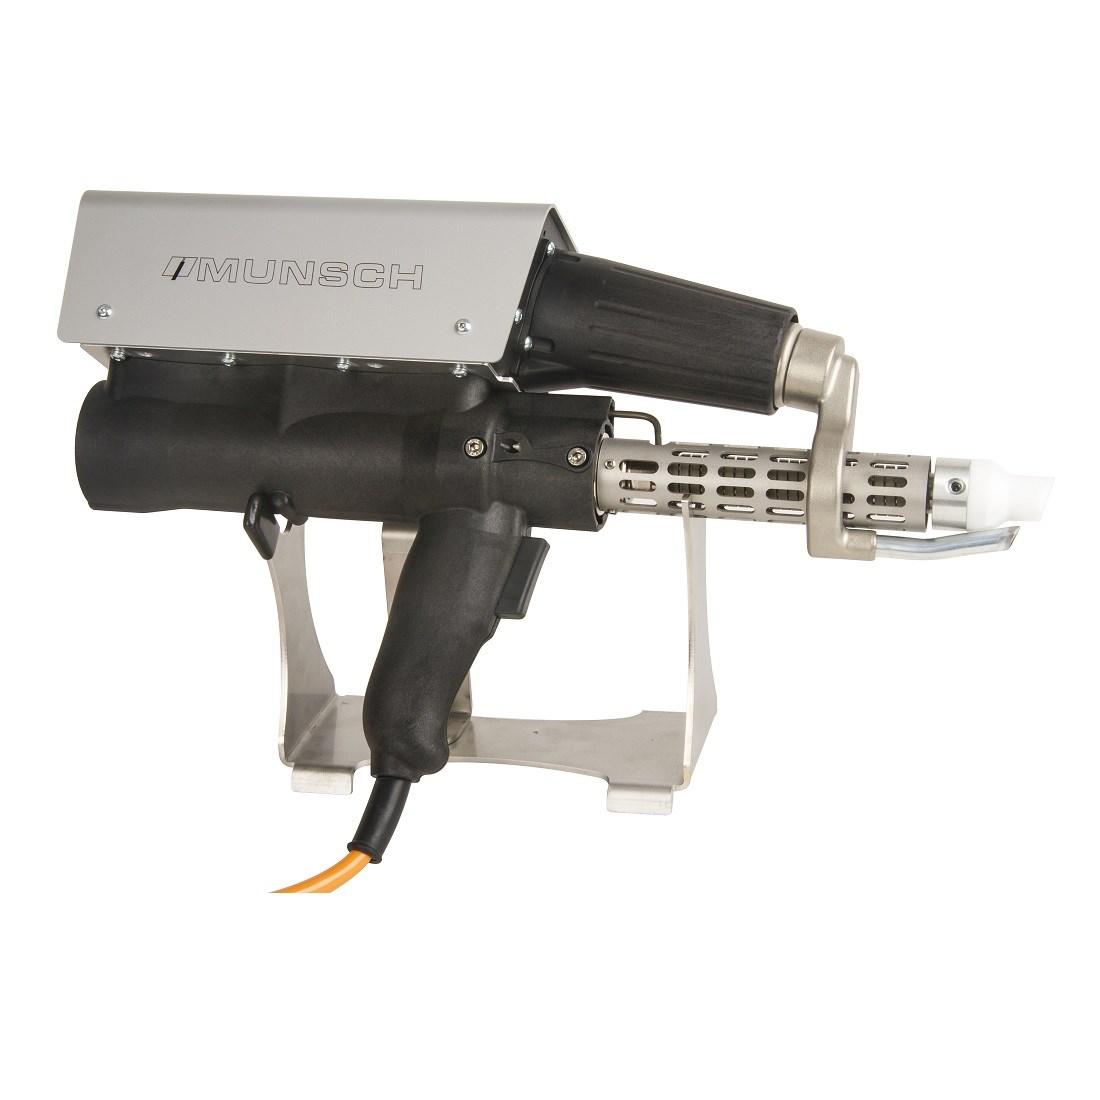 Munsch Extruder Mini 230V 875W/2300W K07400